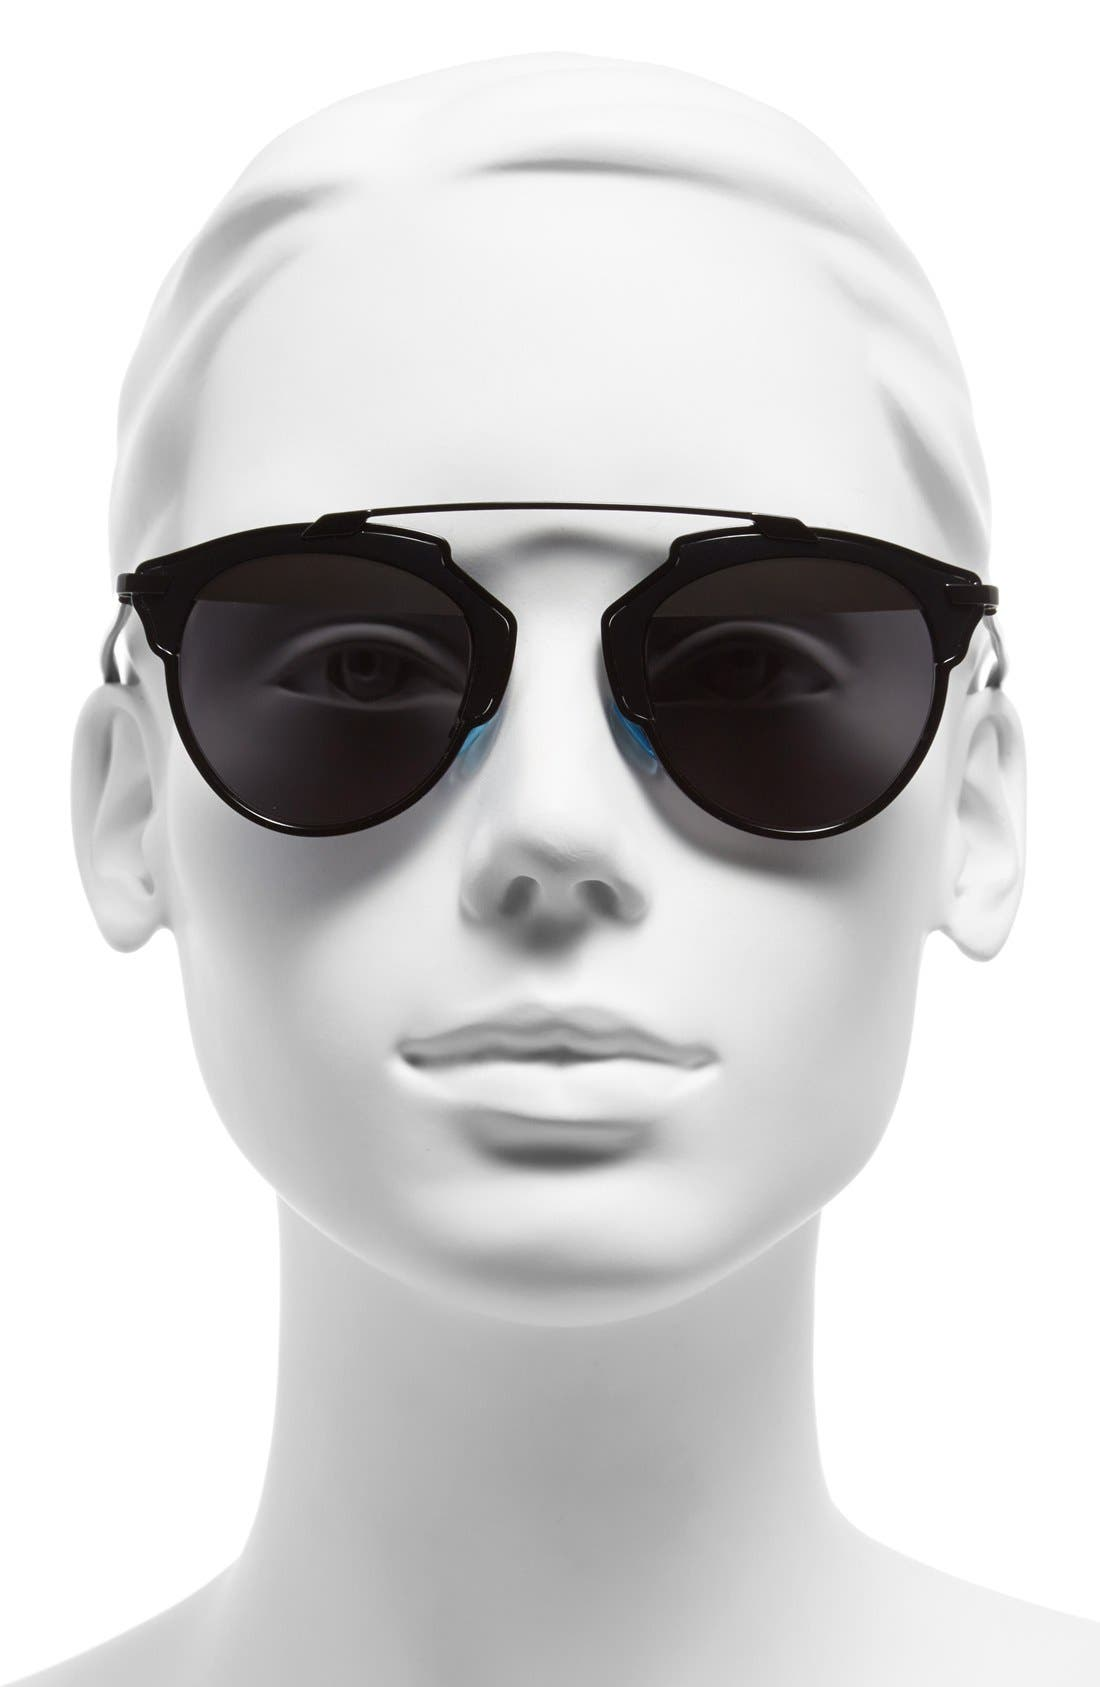 So Real 48mm Brow Bar Sunglasses,                             Alternate thumbnail 27, color,